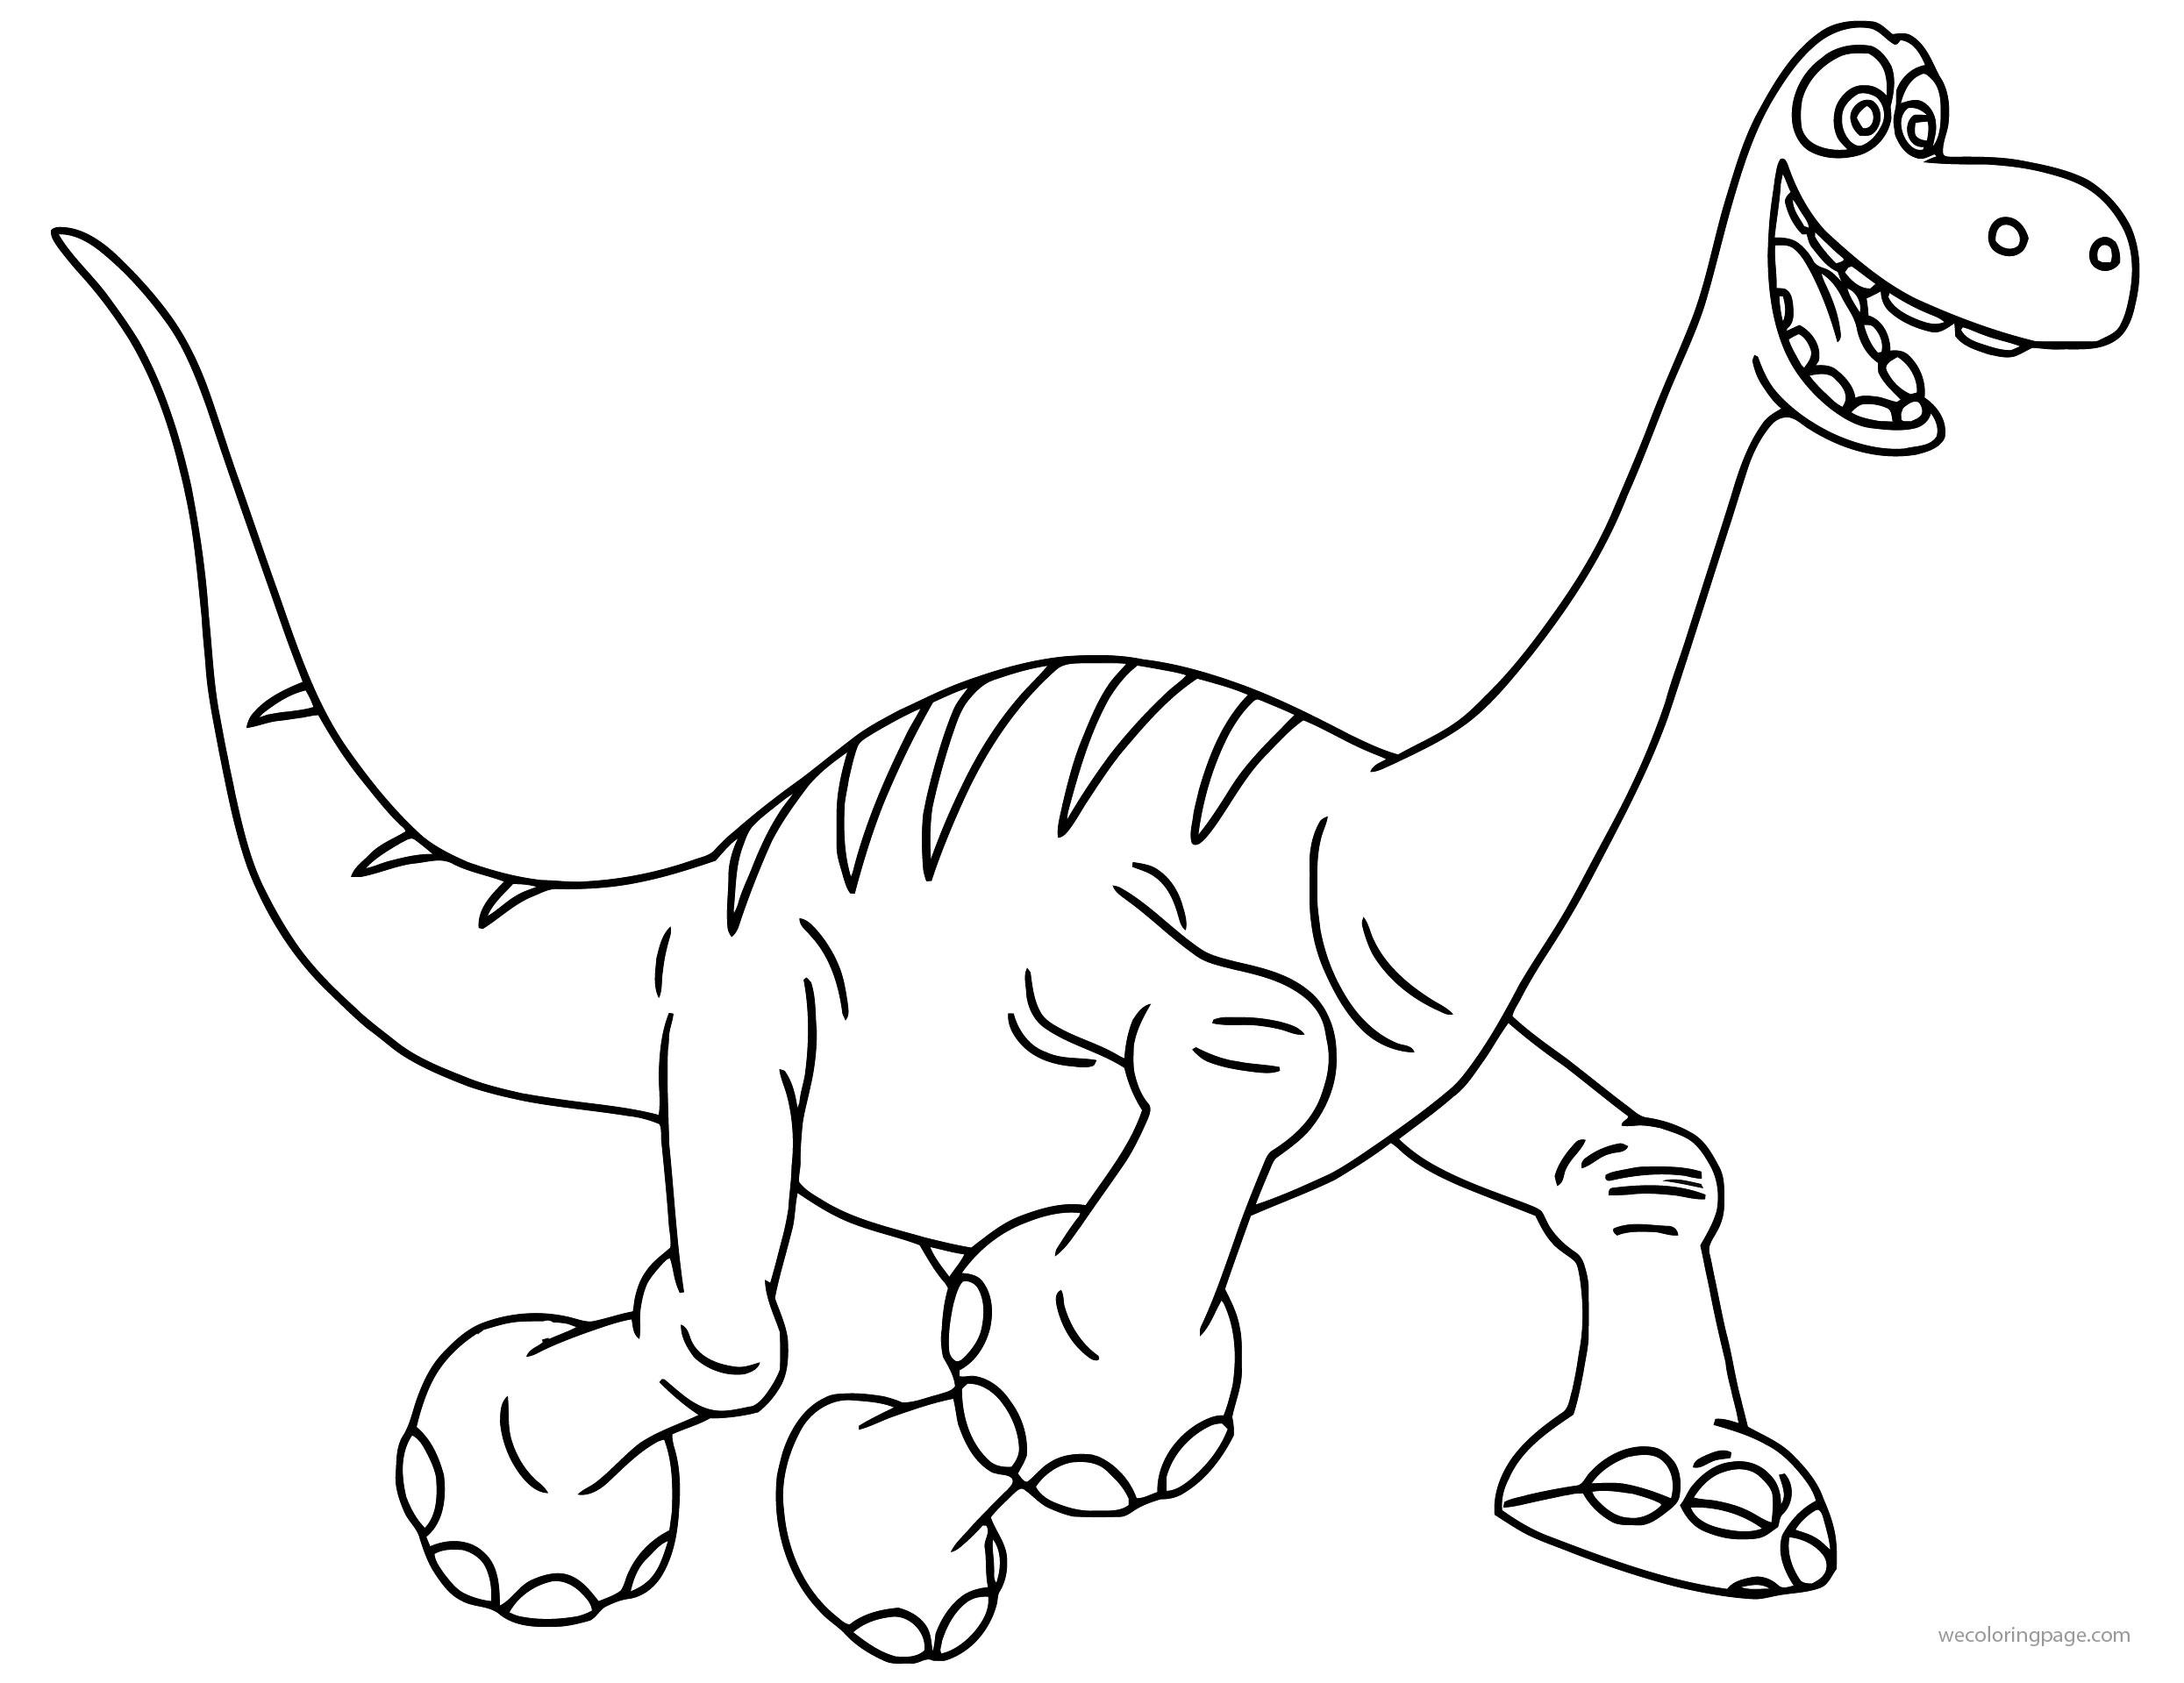 The Good Dinosaur Disney Arlo Cartoon Coloring Pages